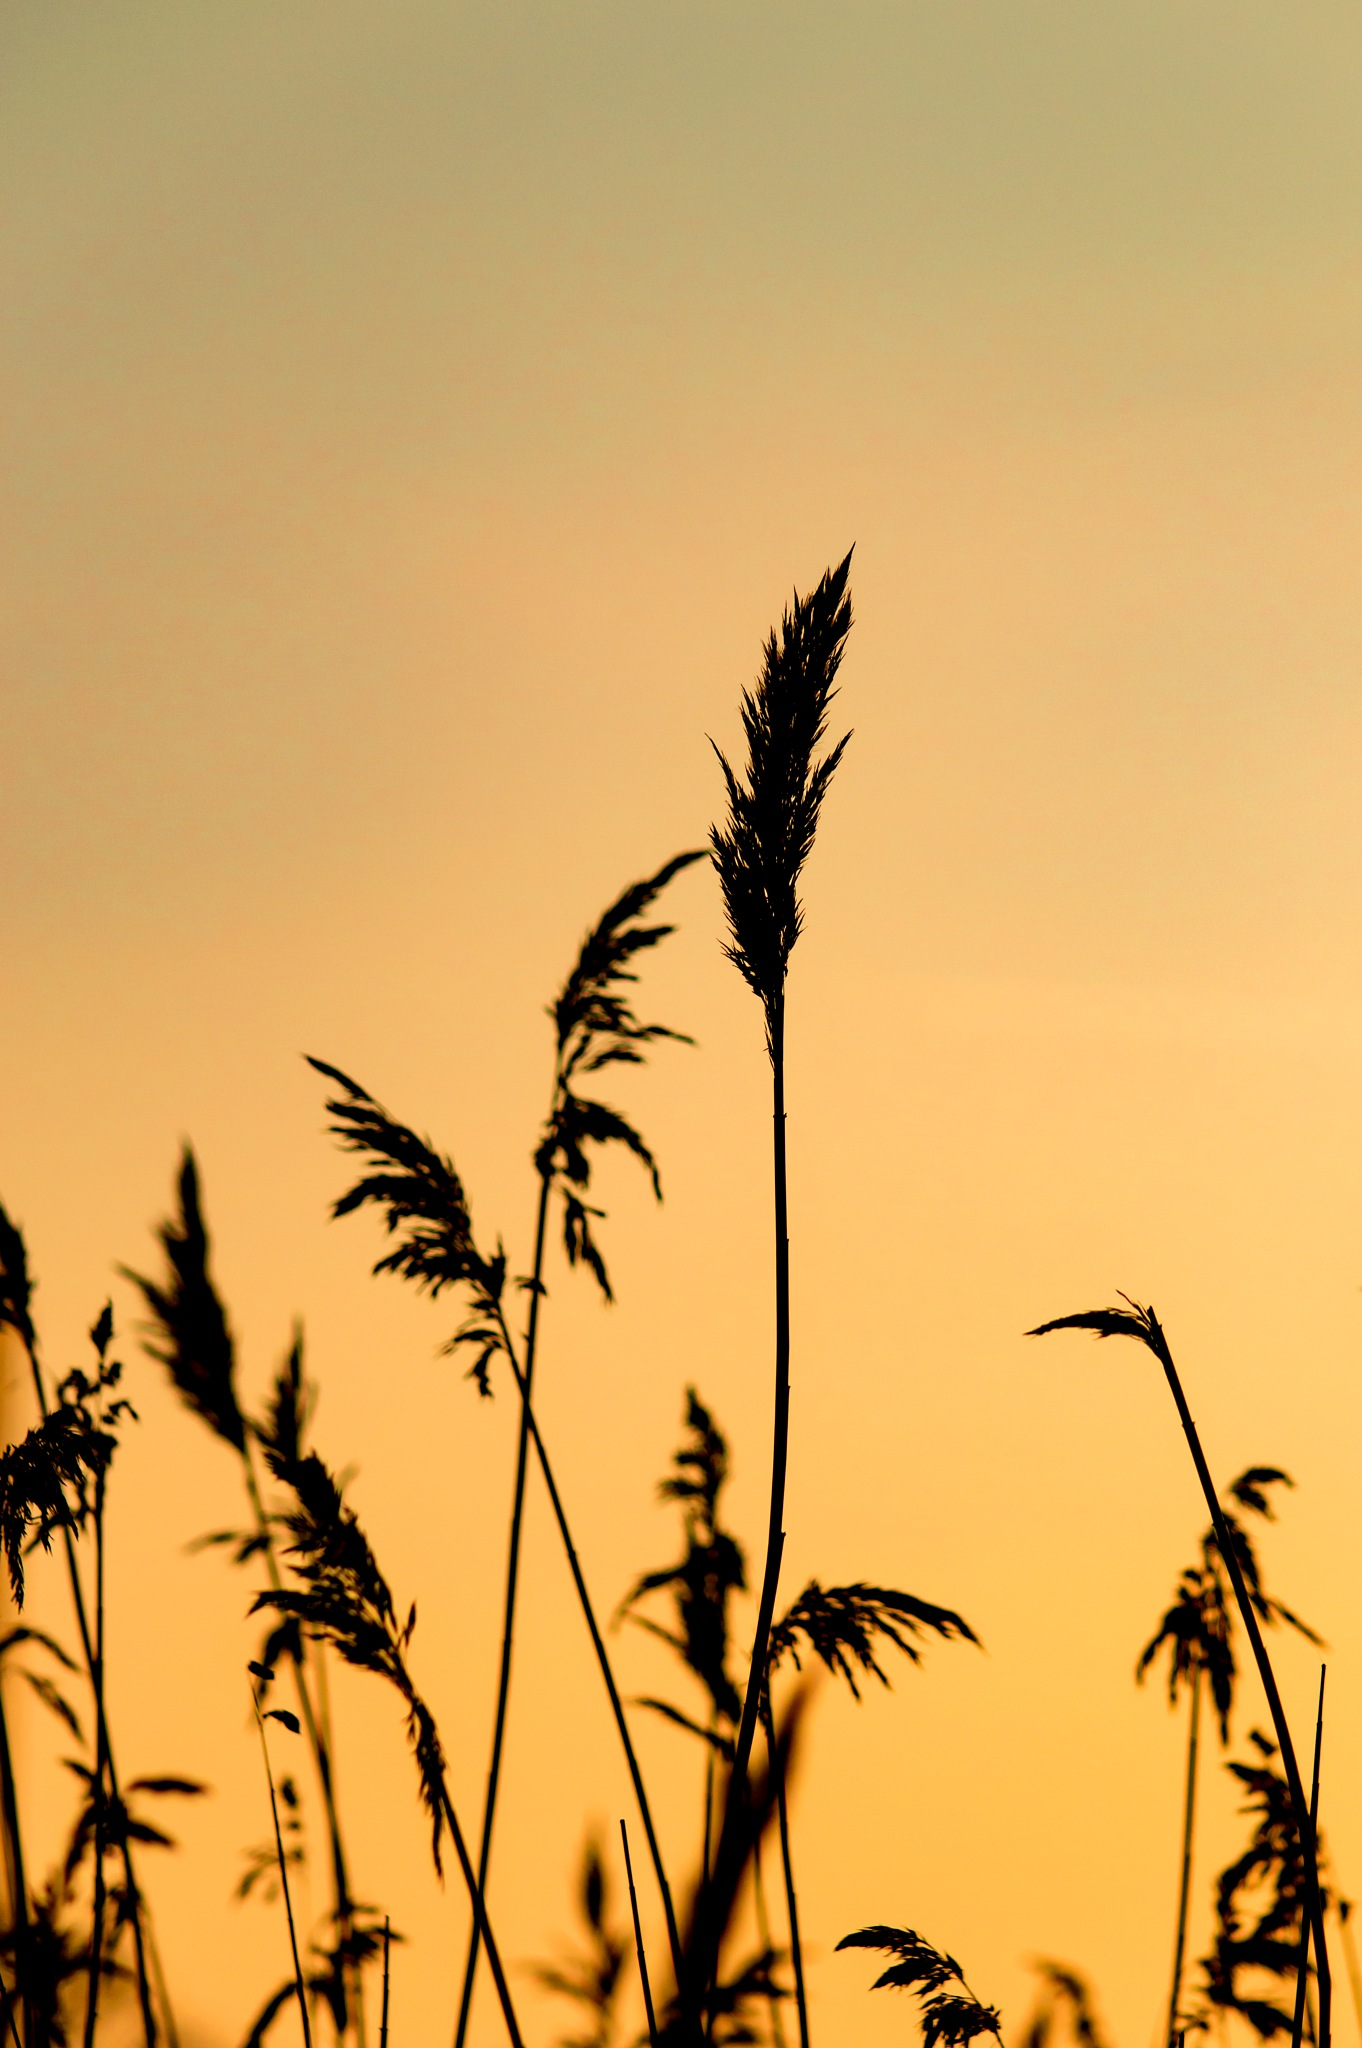 Golden hour grasses by Dan Sealey